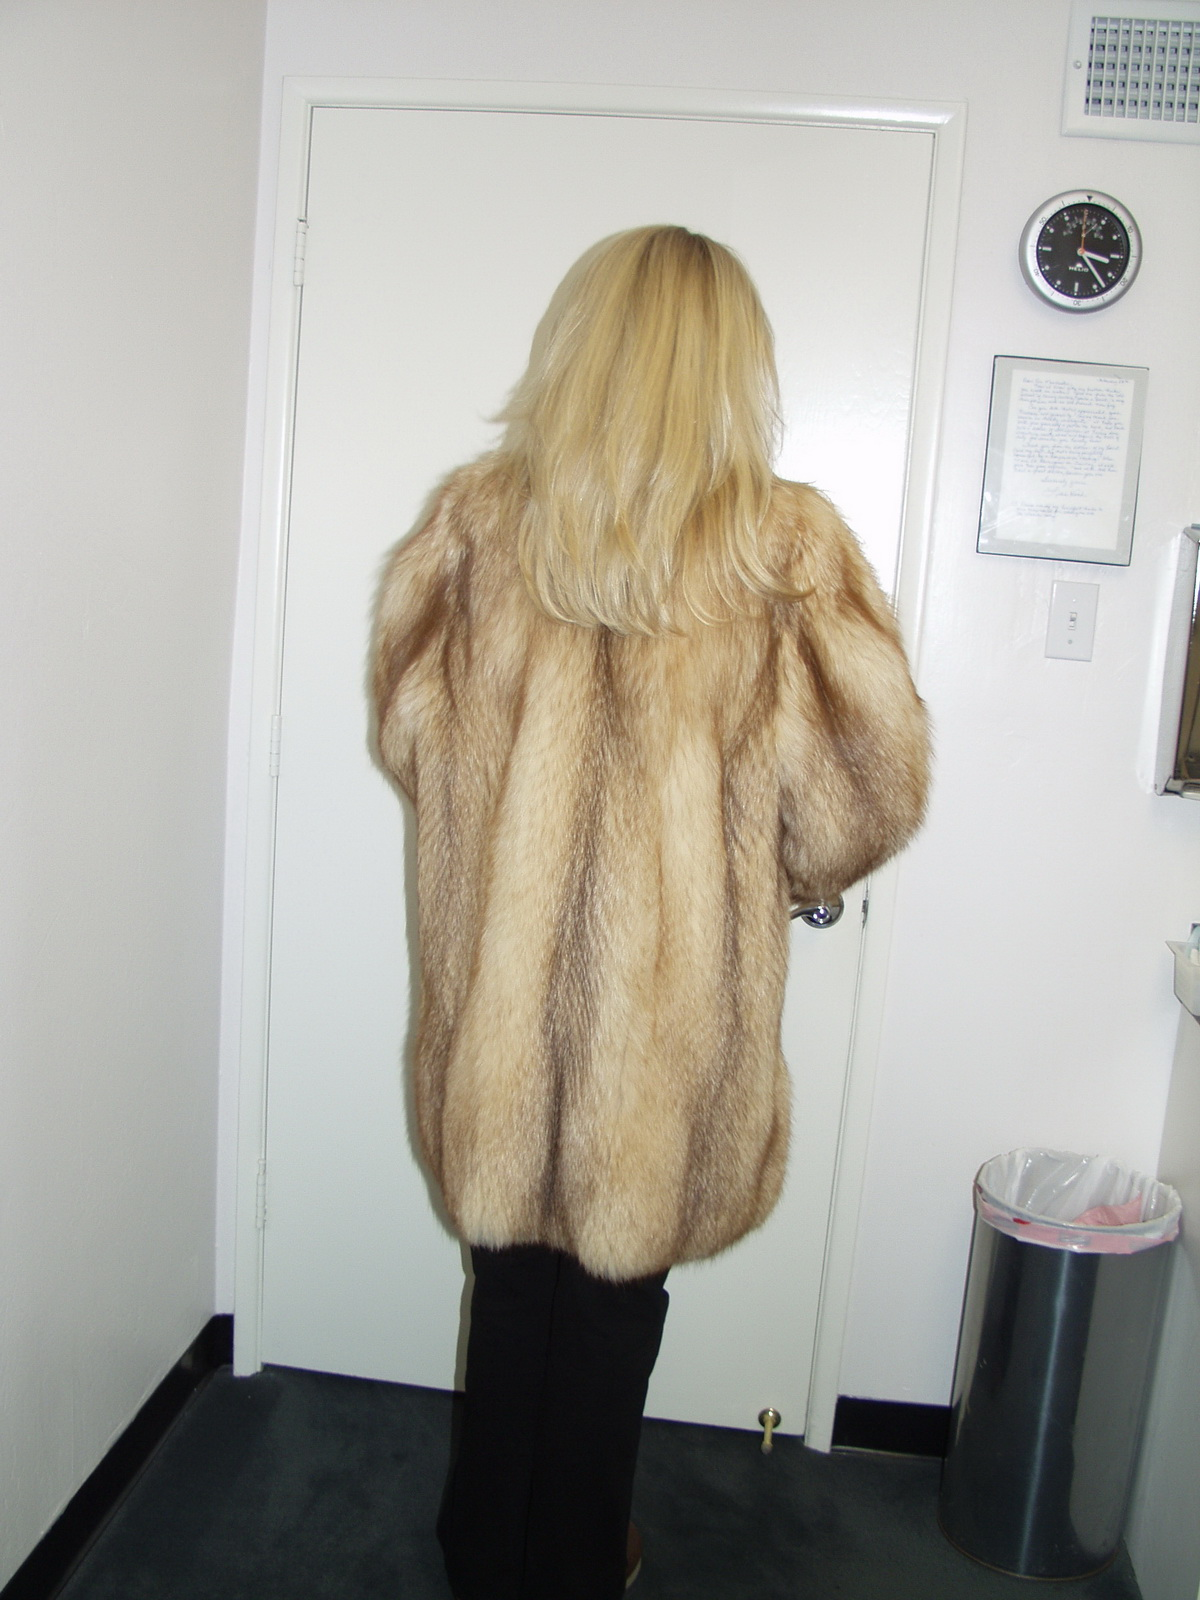 image Fur coat teen hot amateur in park alone